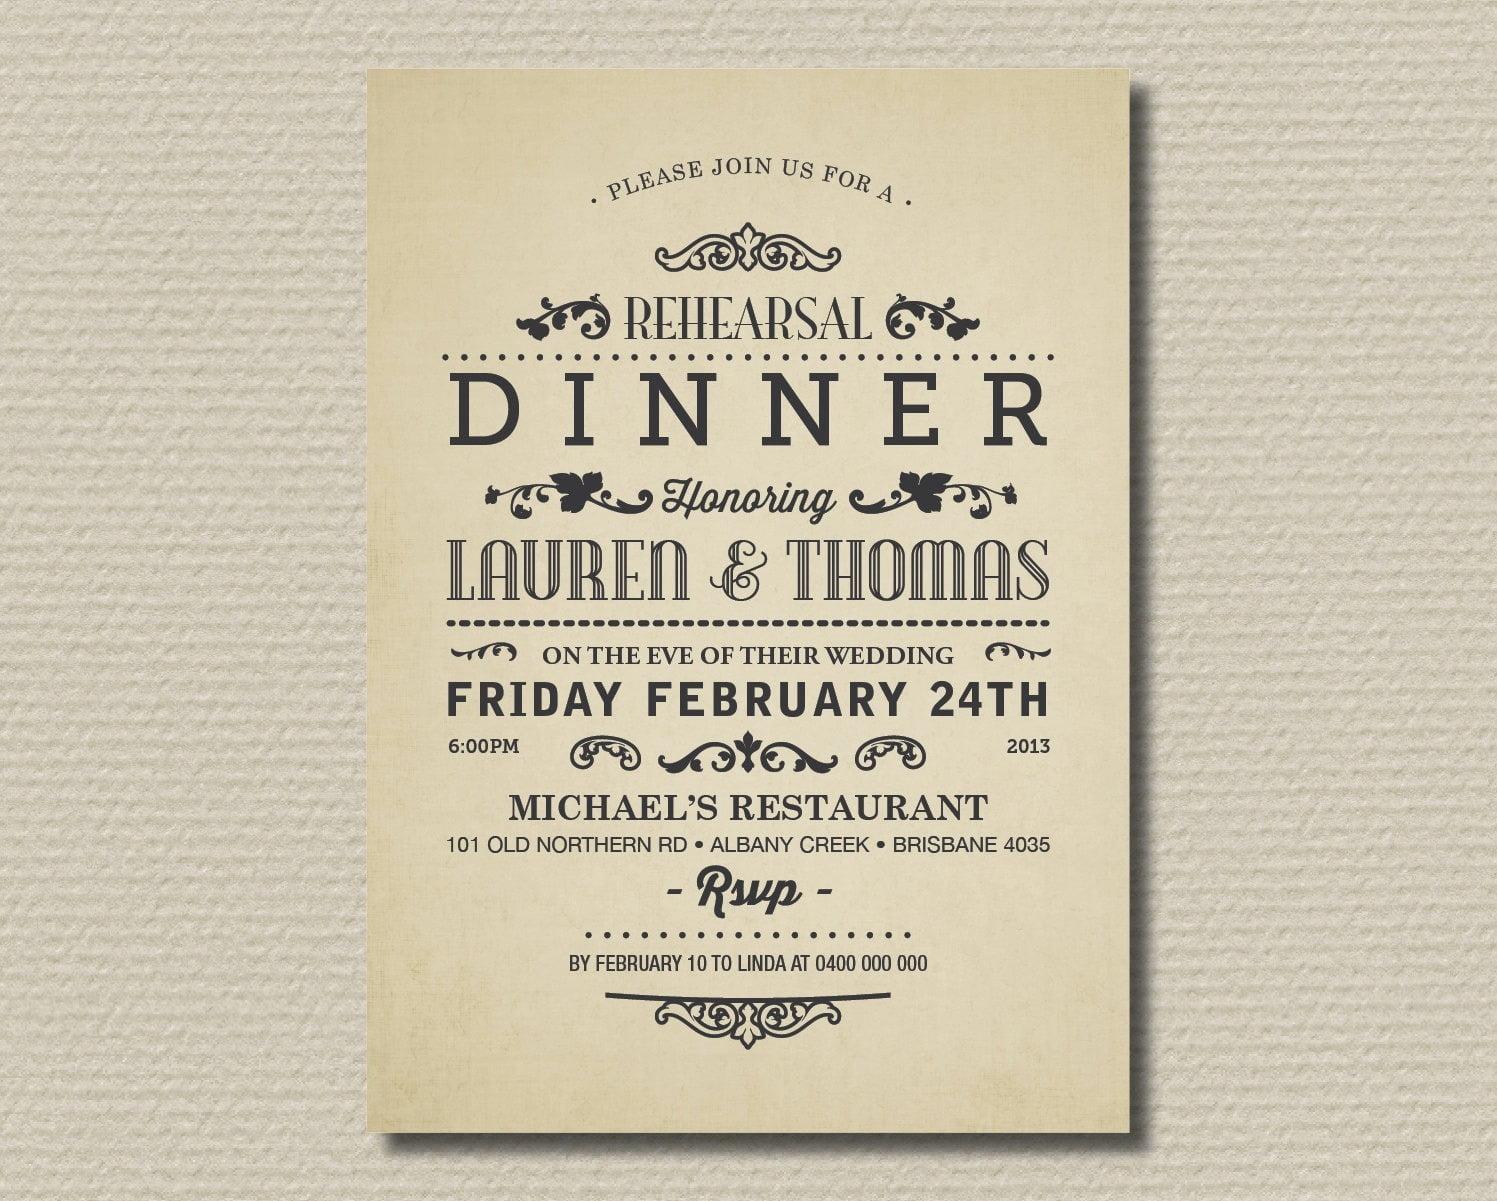 Dinner Invitation Templates Free Sample Example Format High